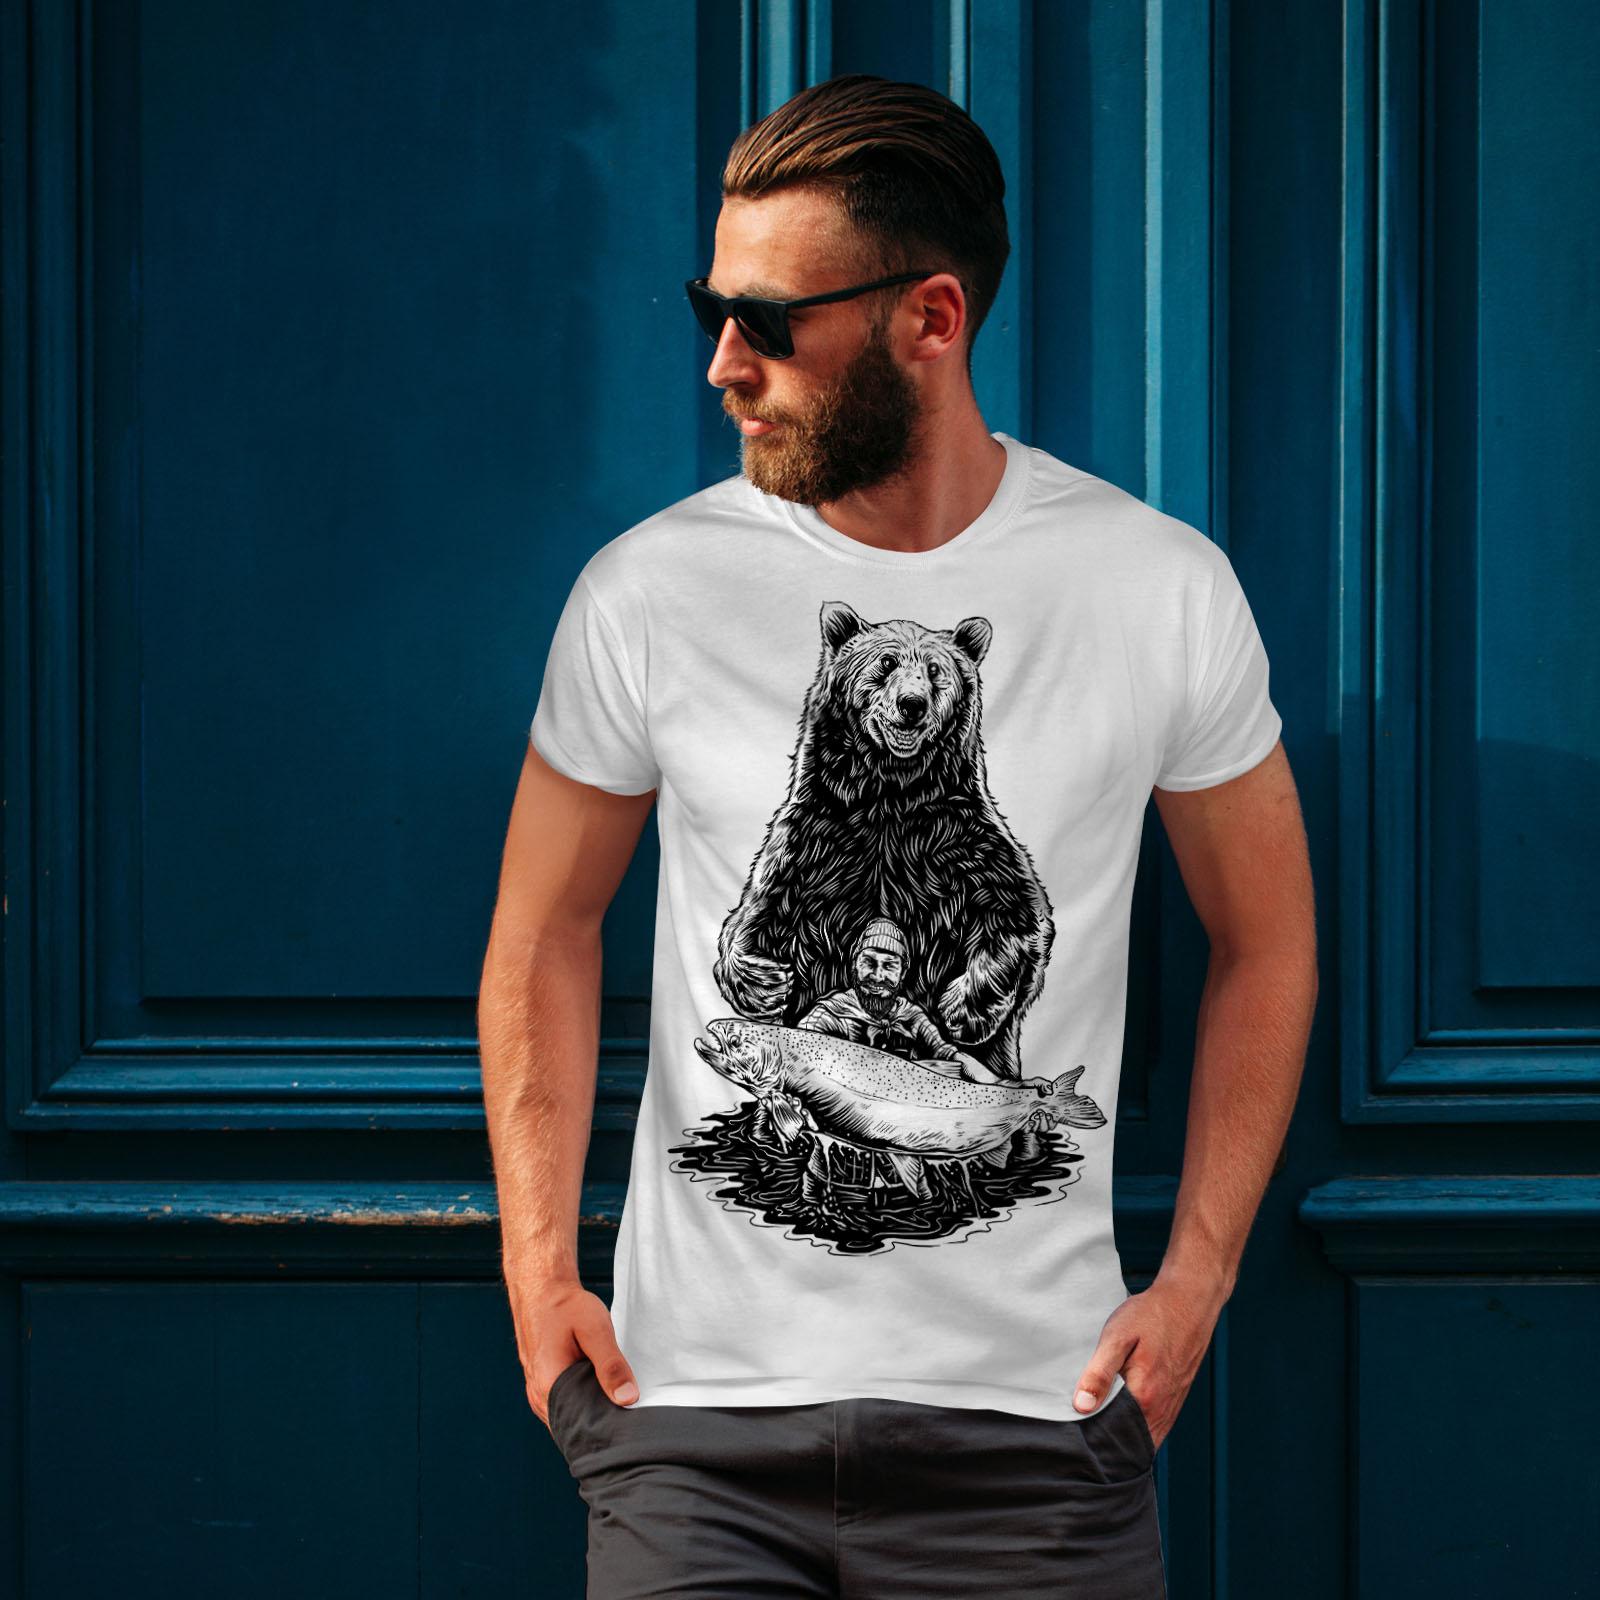 miniature 10 - Wellcoda Fishing Bear Angler Mens T-shirt, Grizzly Graphic Design Printed Tee